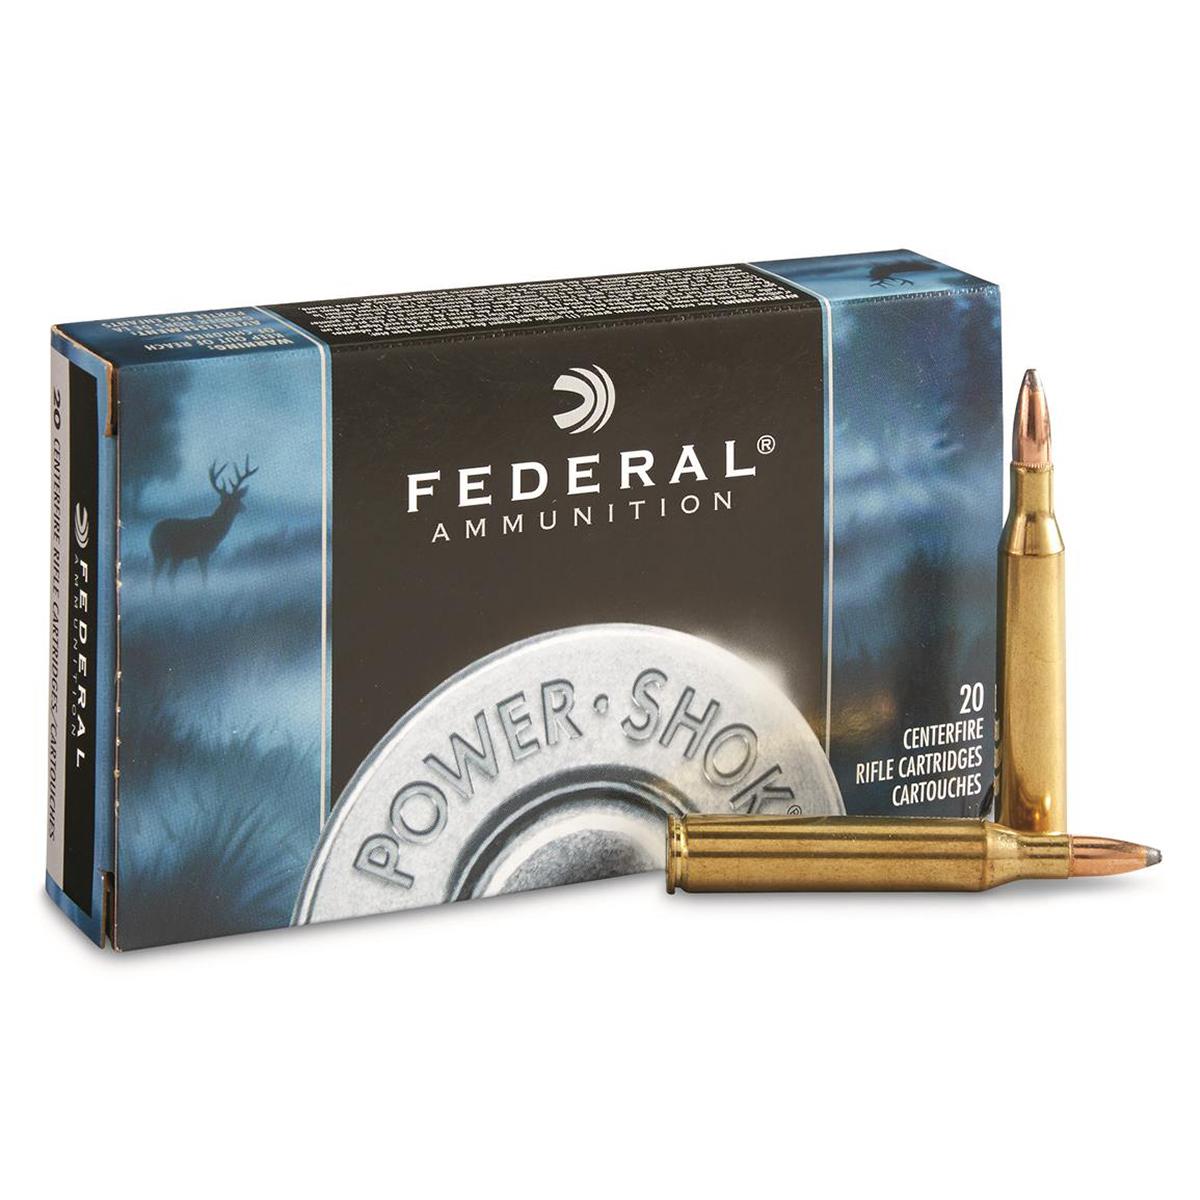 Federal Power-Shok Rifle Ammo, 7MM Mauser, 140-gr, HCSP